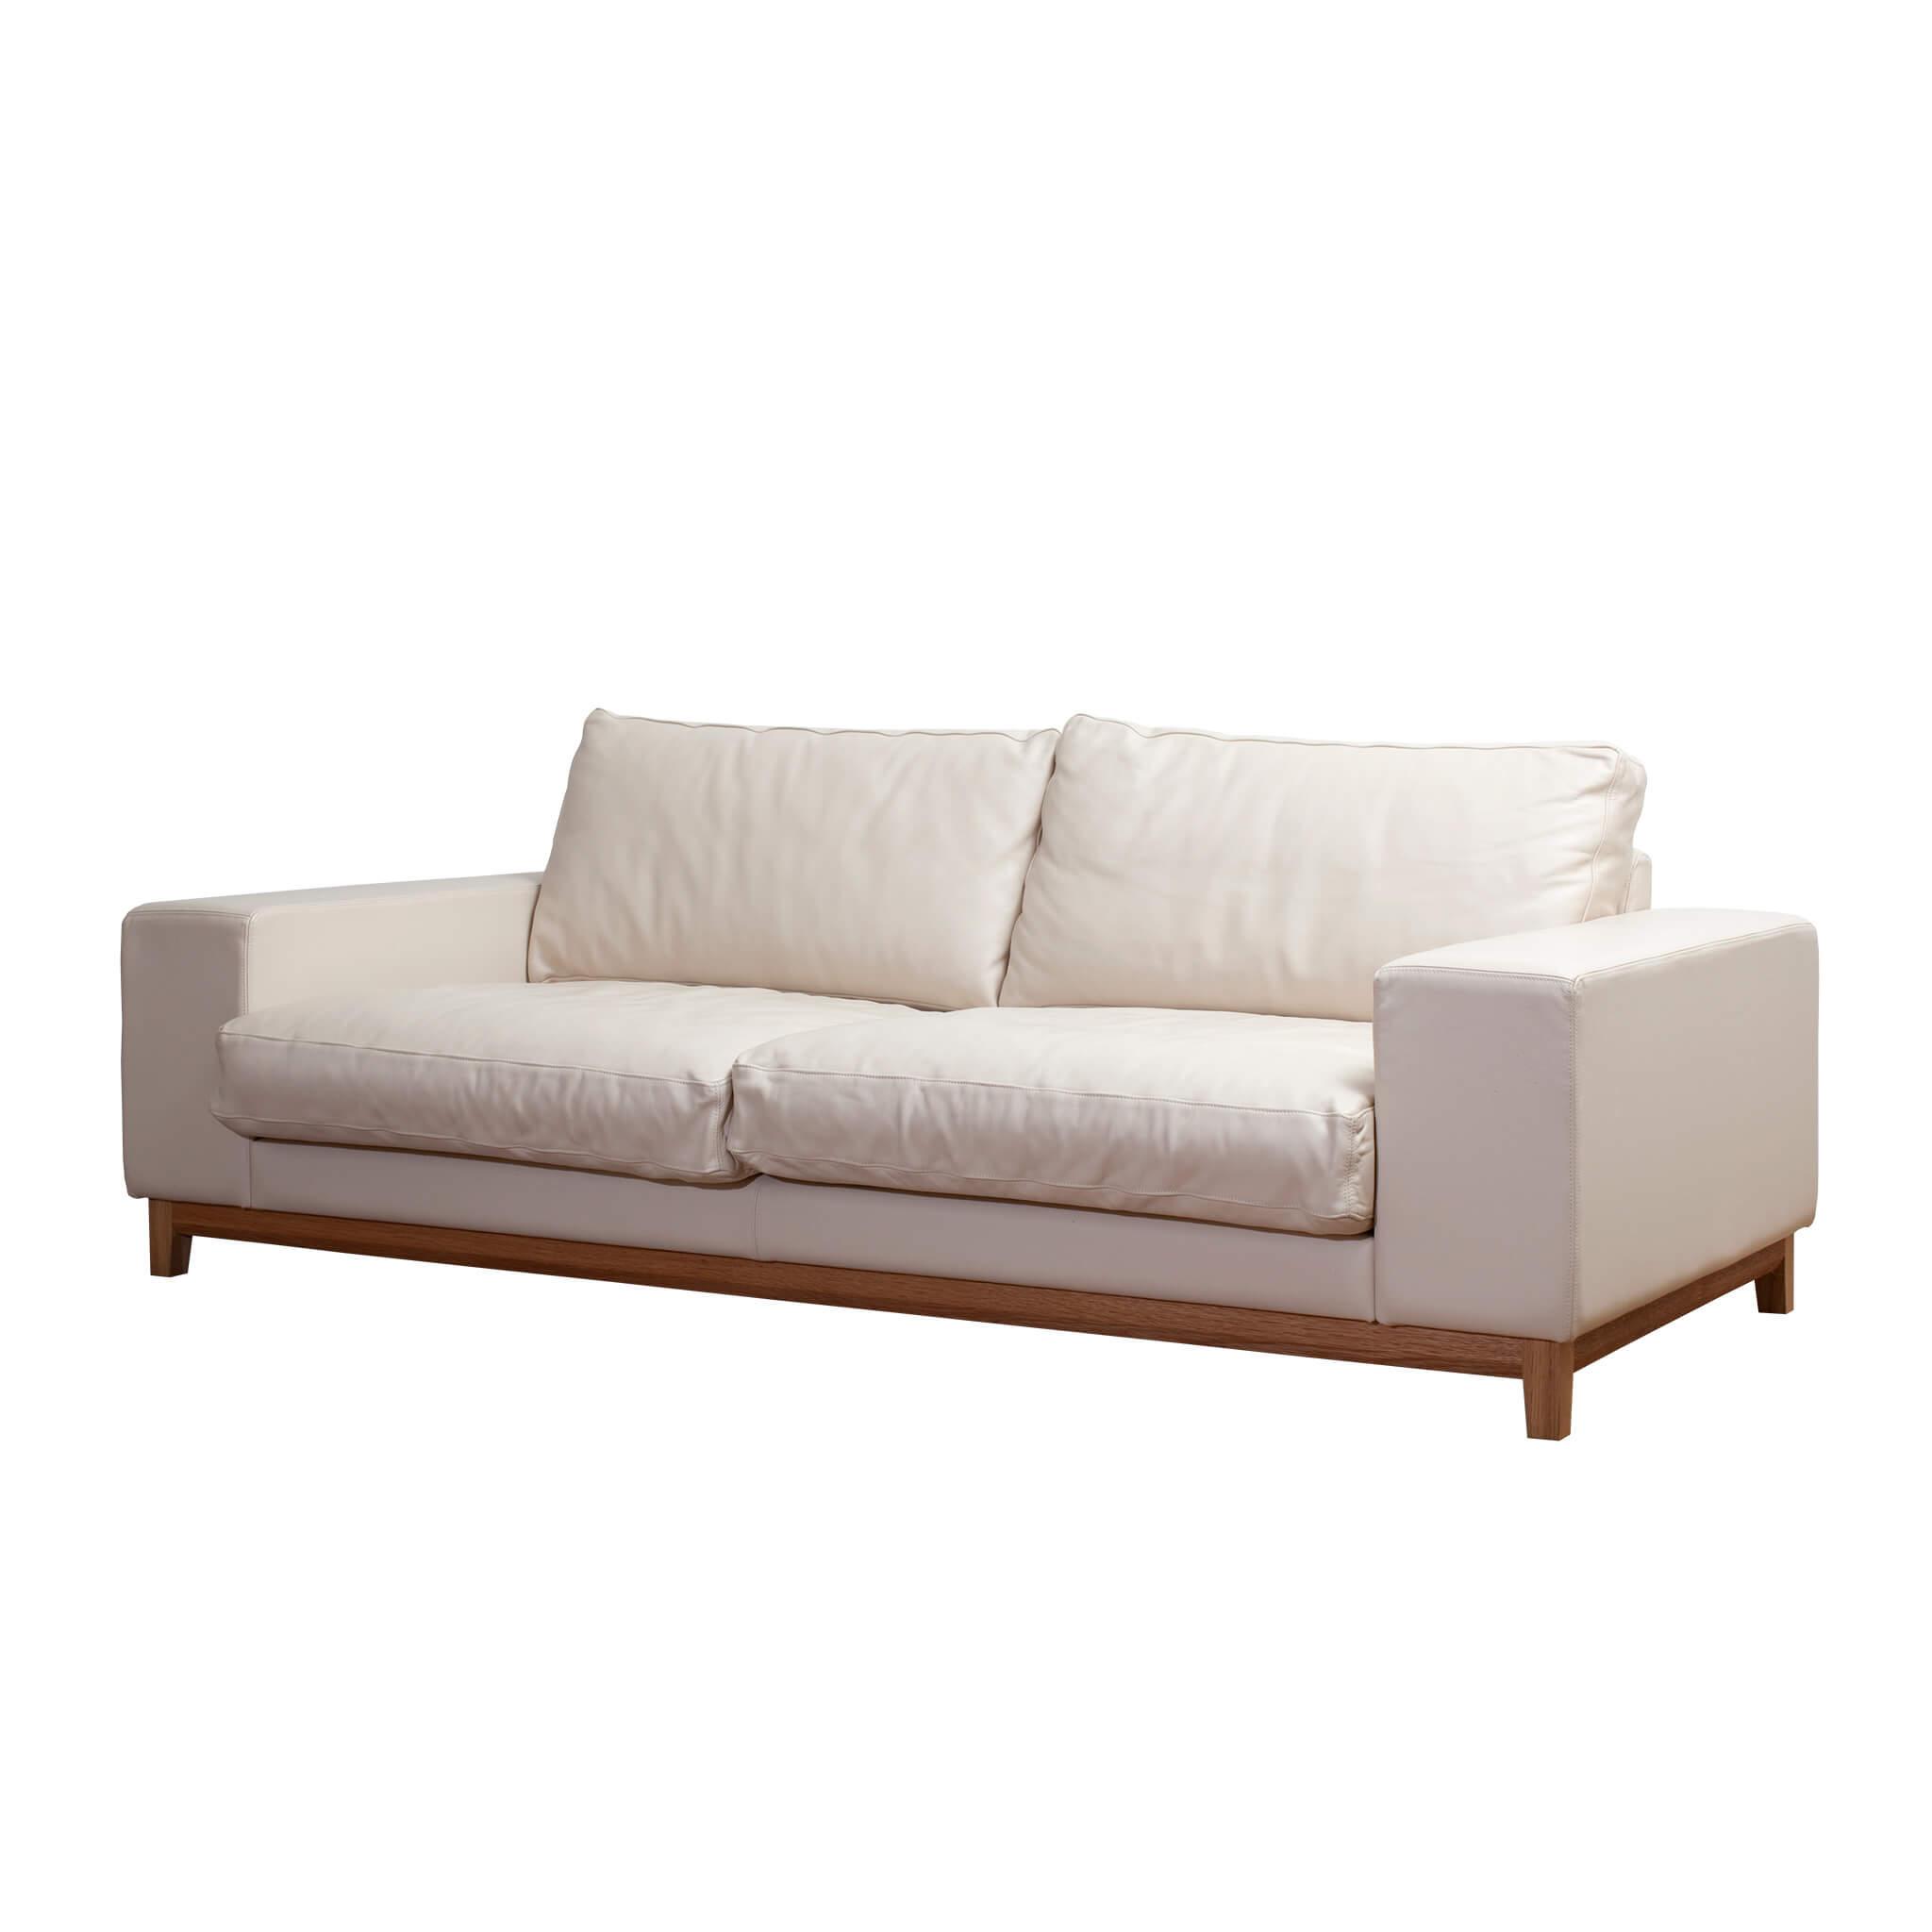 FLOW sofa 2p